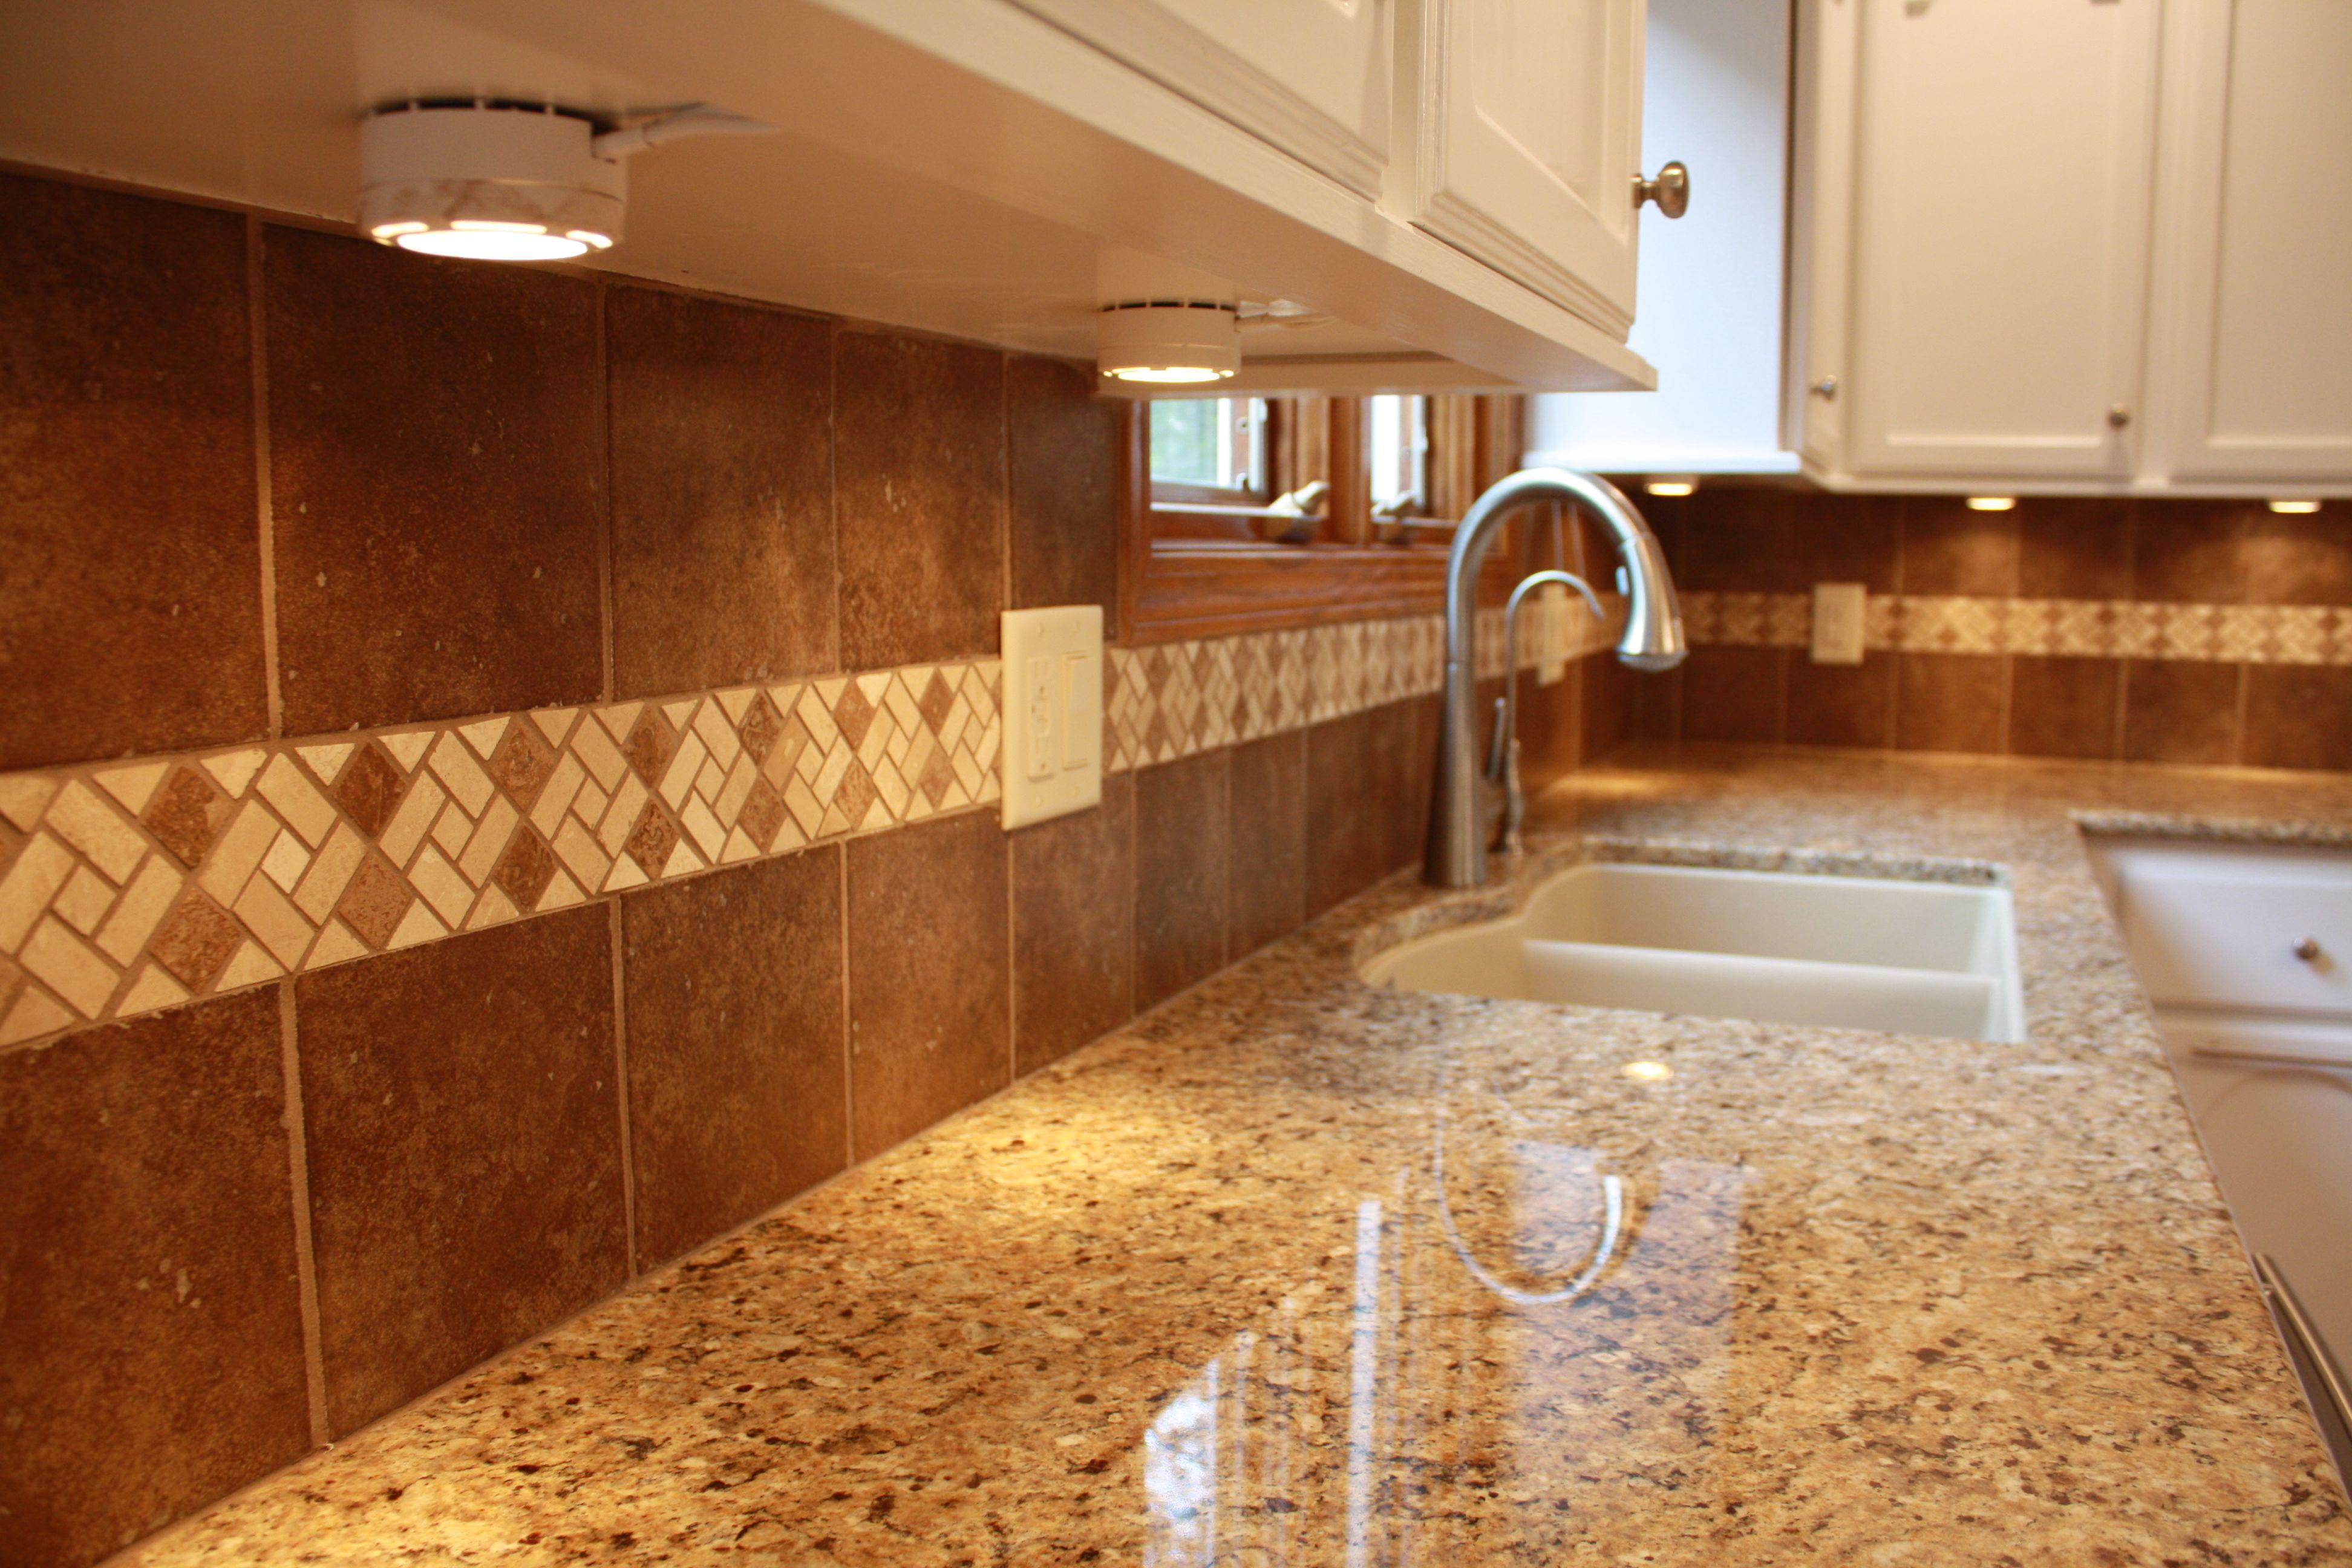 Azas Brown Samara 6x6 Tile With Azteca Mocha Canyon Ridge